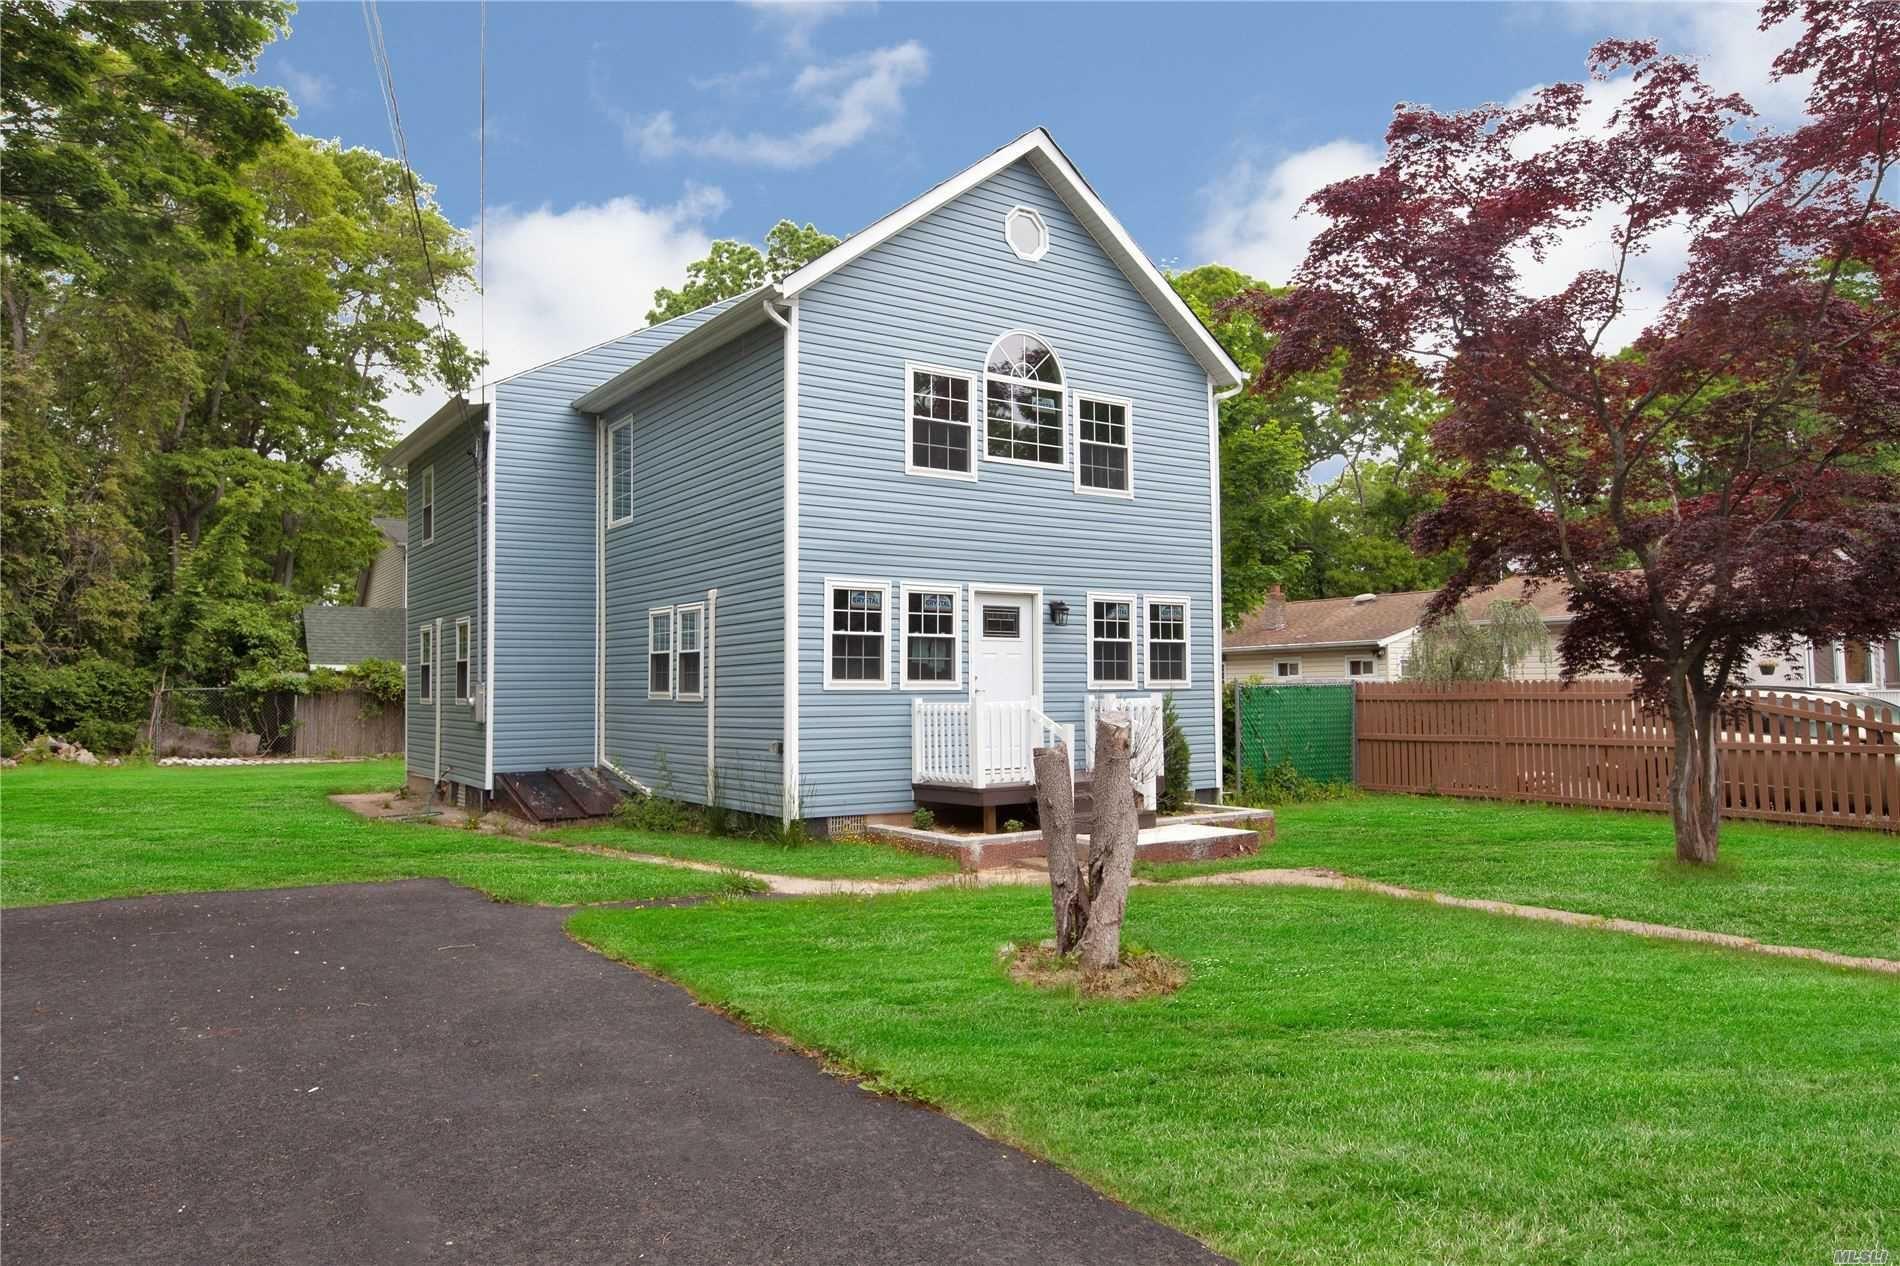 137 Southaven Avenue, Mastic, NY 11950 - MLS#: 3229915